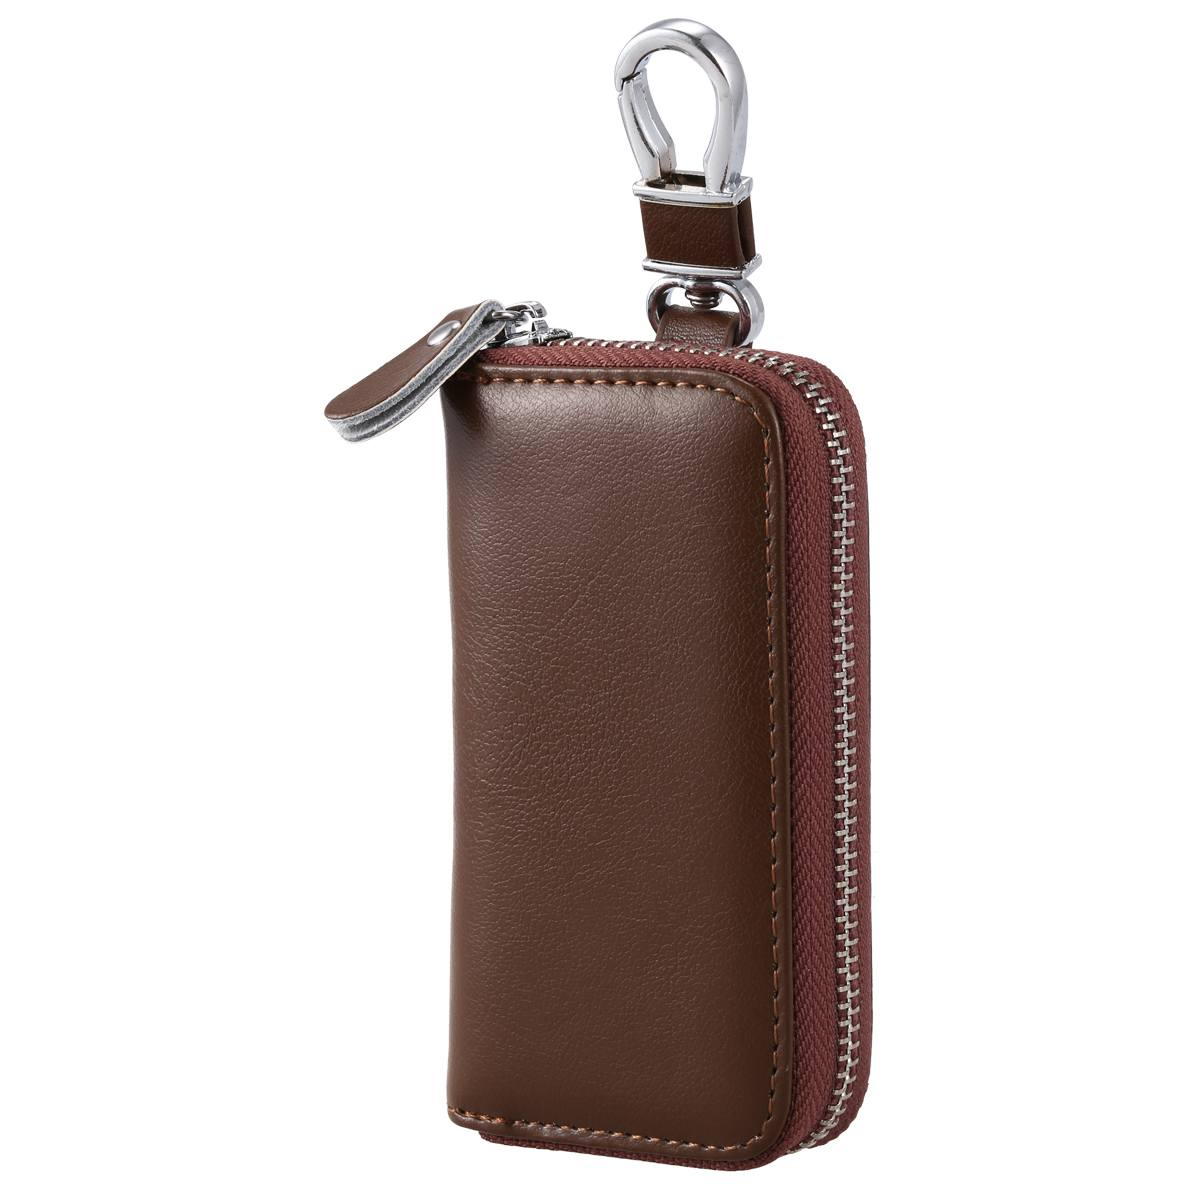 f24c659732b87 Details about Men Leather Zip Around 6 Hook Key Case Car Key Holder Wallet  ( brown) Q3S4